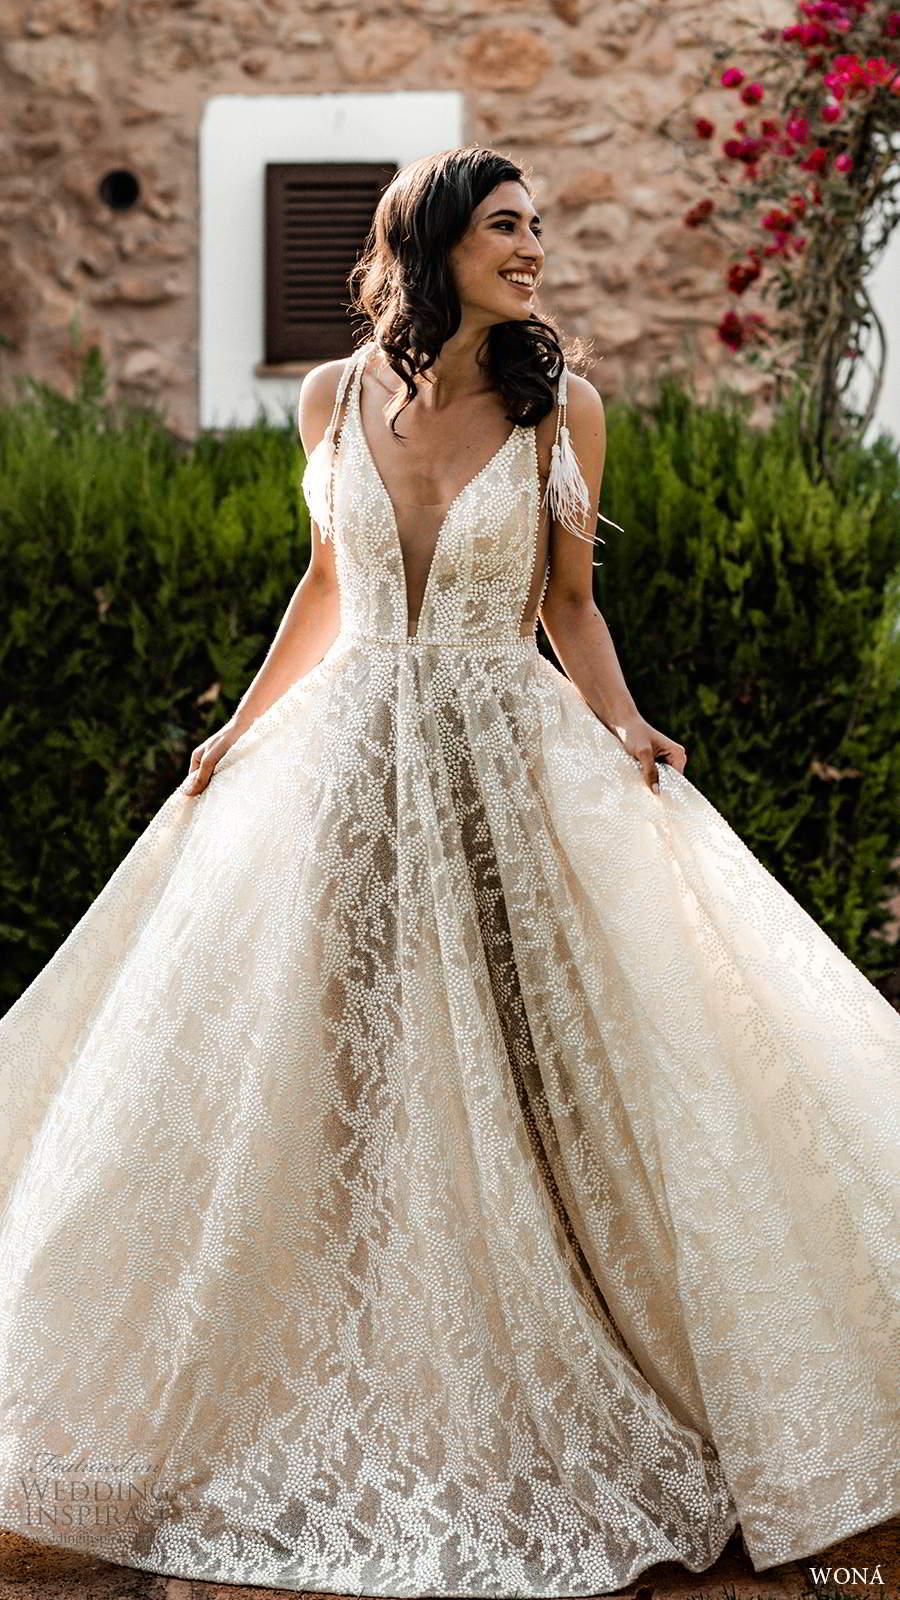 wona fall 2020 bridal sleeveless straps plunging v neckline fully embellished a line ball gown wedding dress v back cathedral train (16) mv